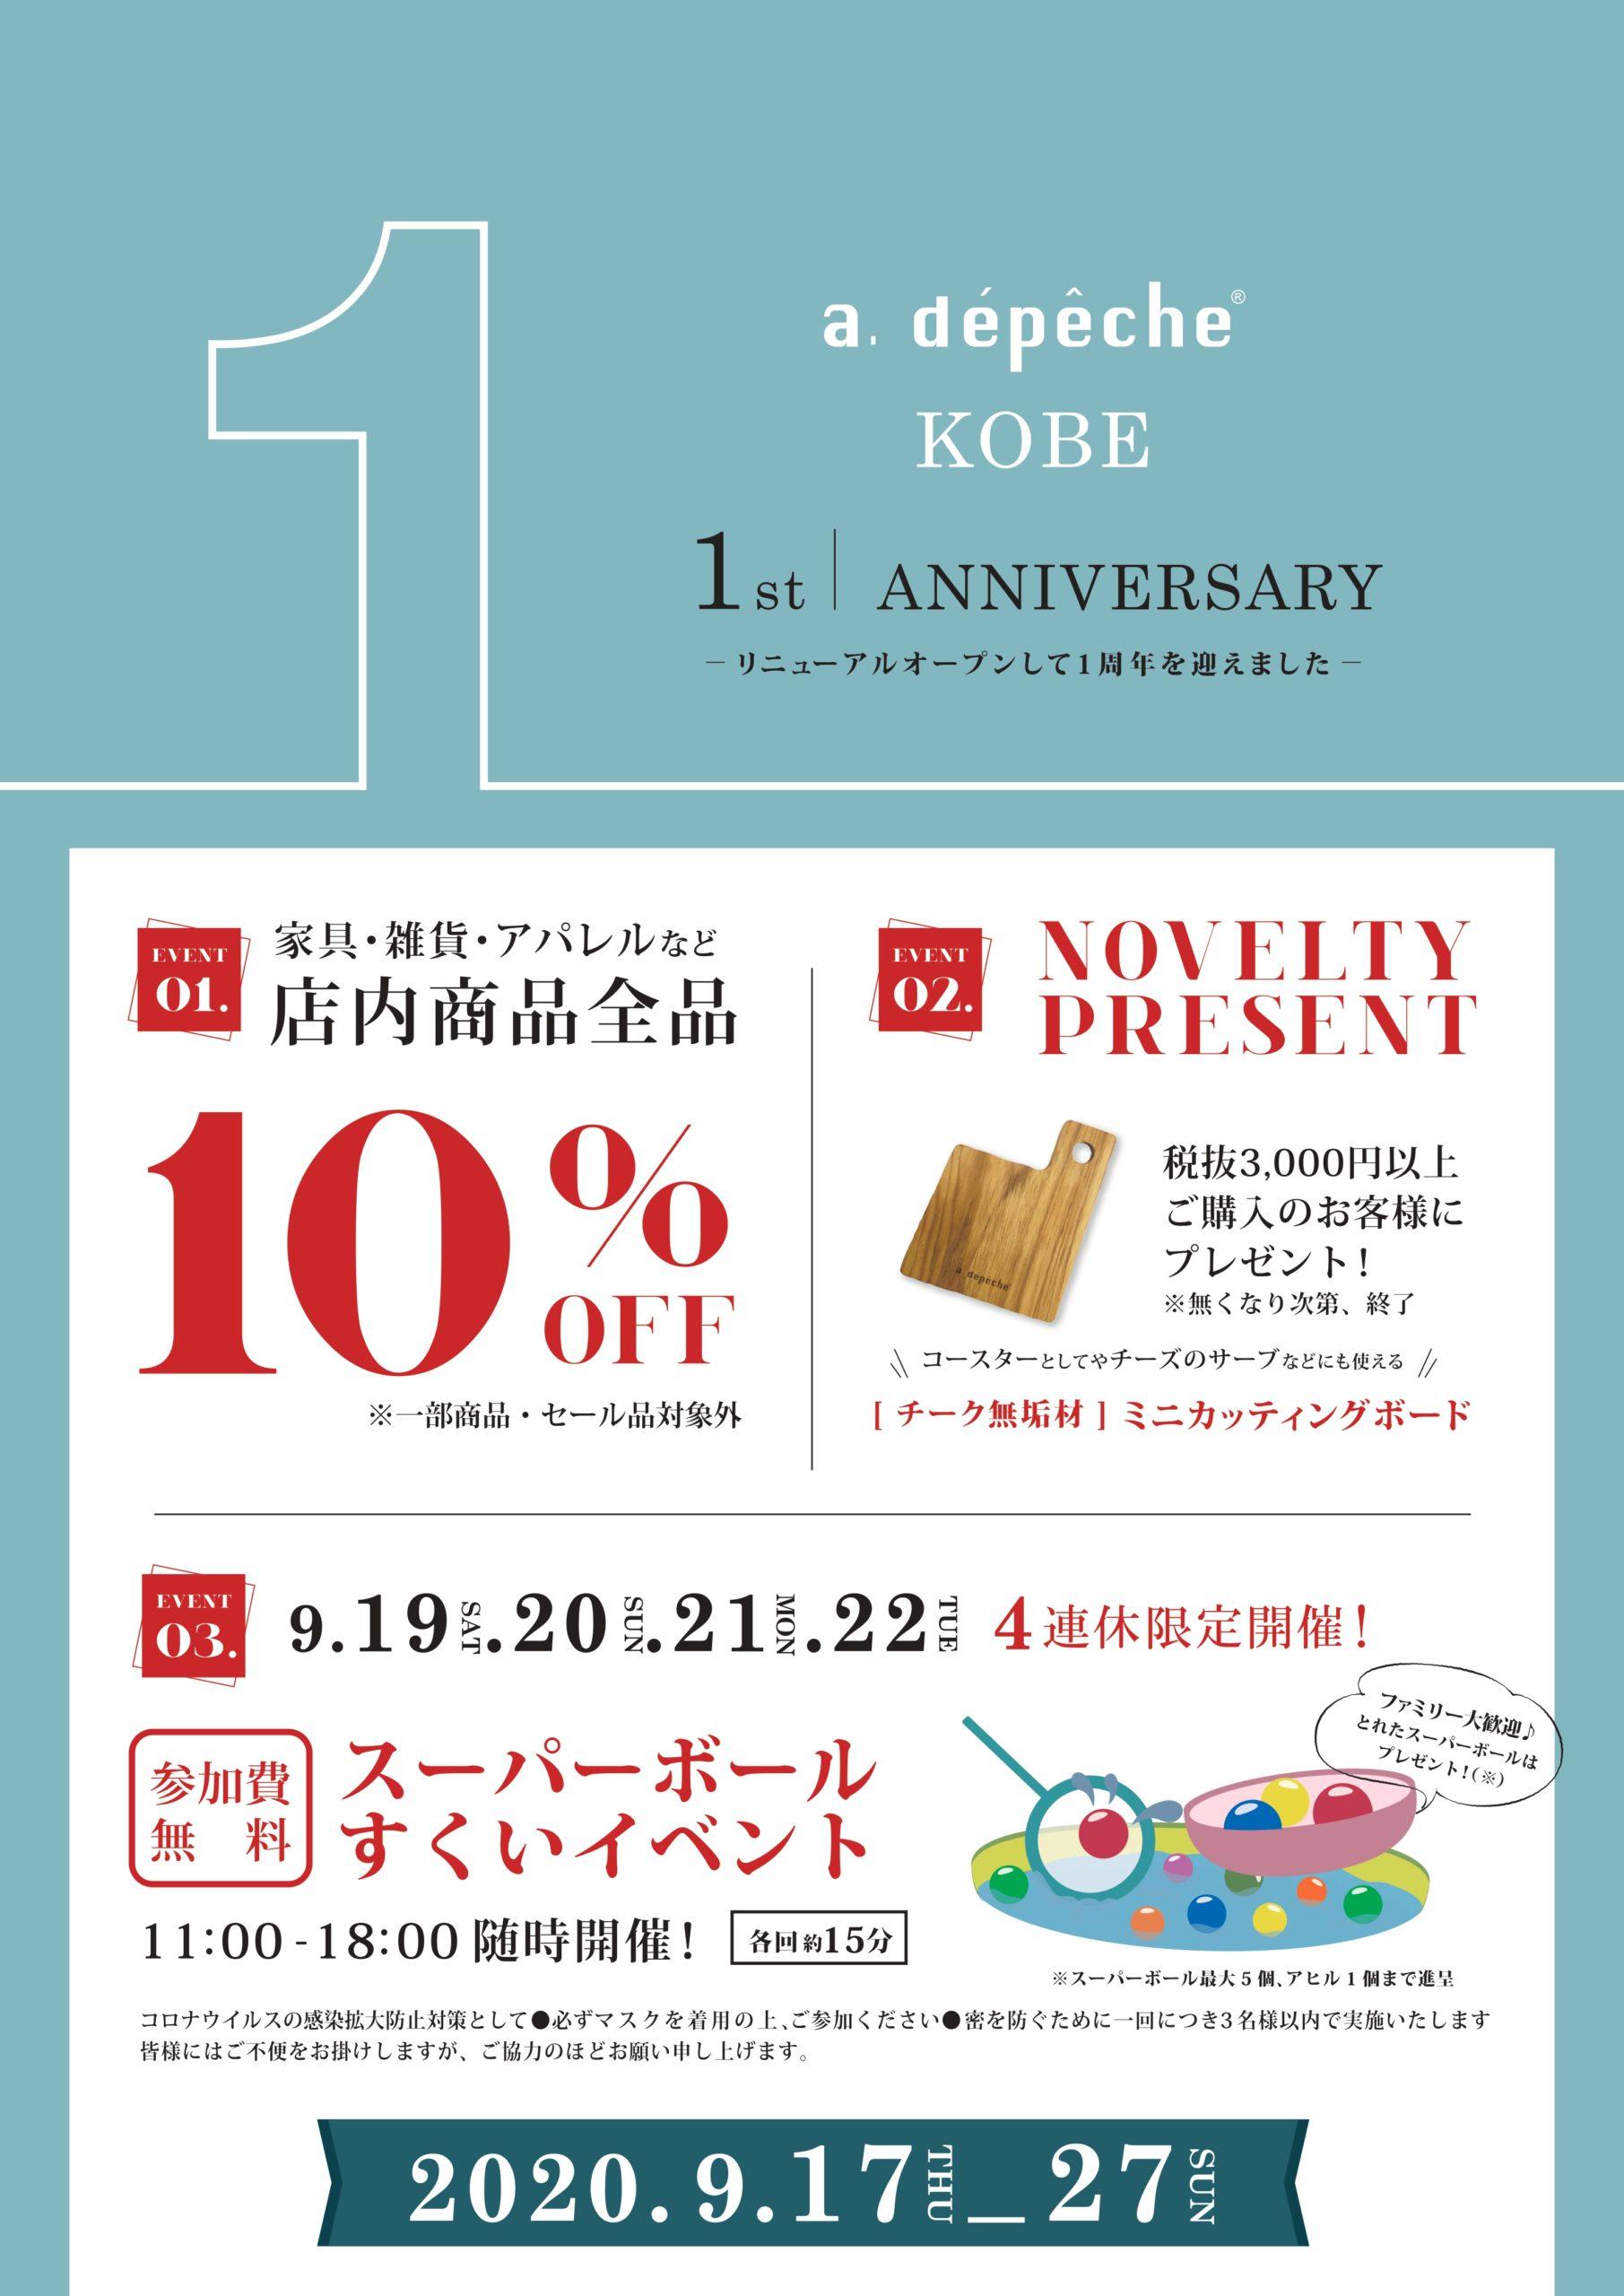 【a.depeche神戸店】リニューアル周年祭!